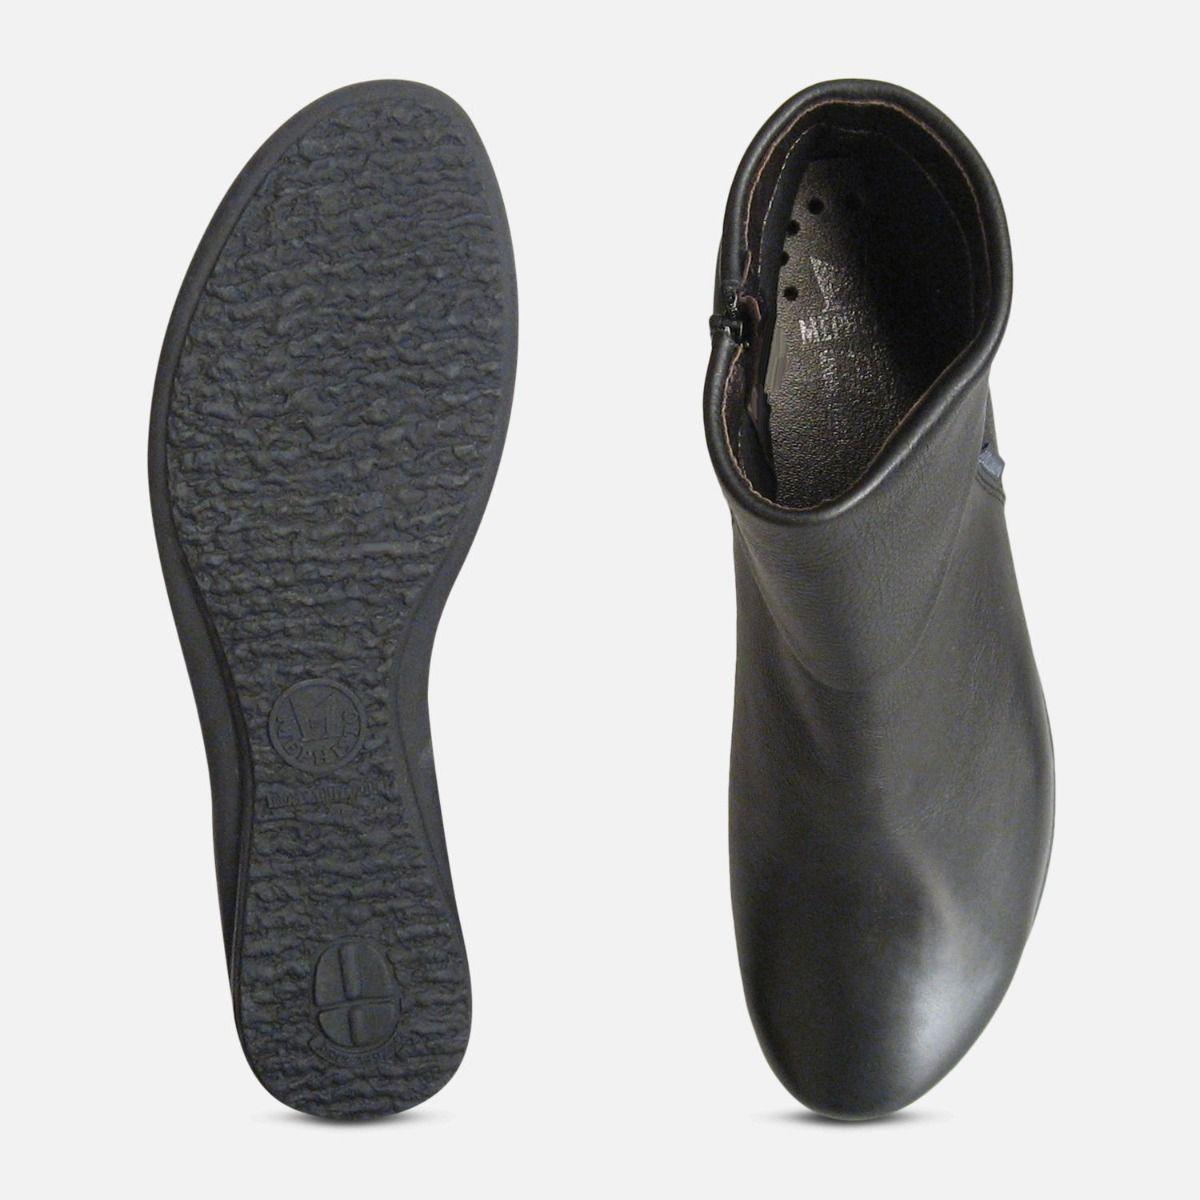 Mephisto Ladies Fiducia Black Leather Zip Boots